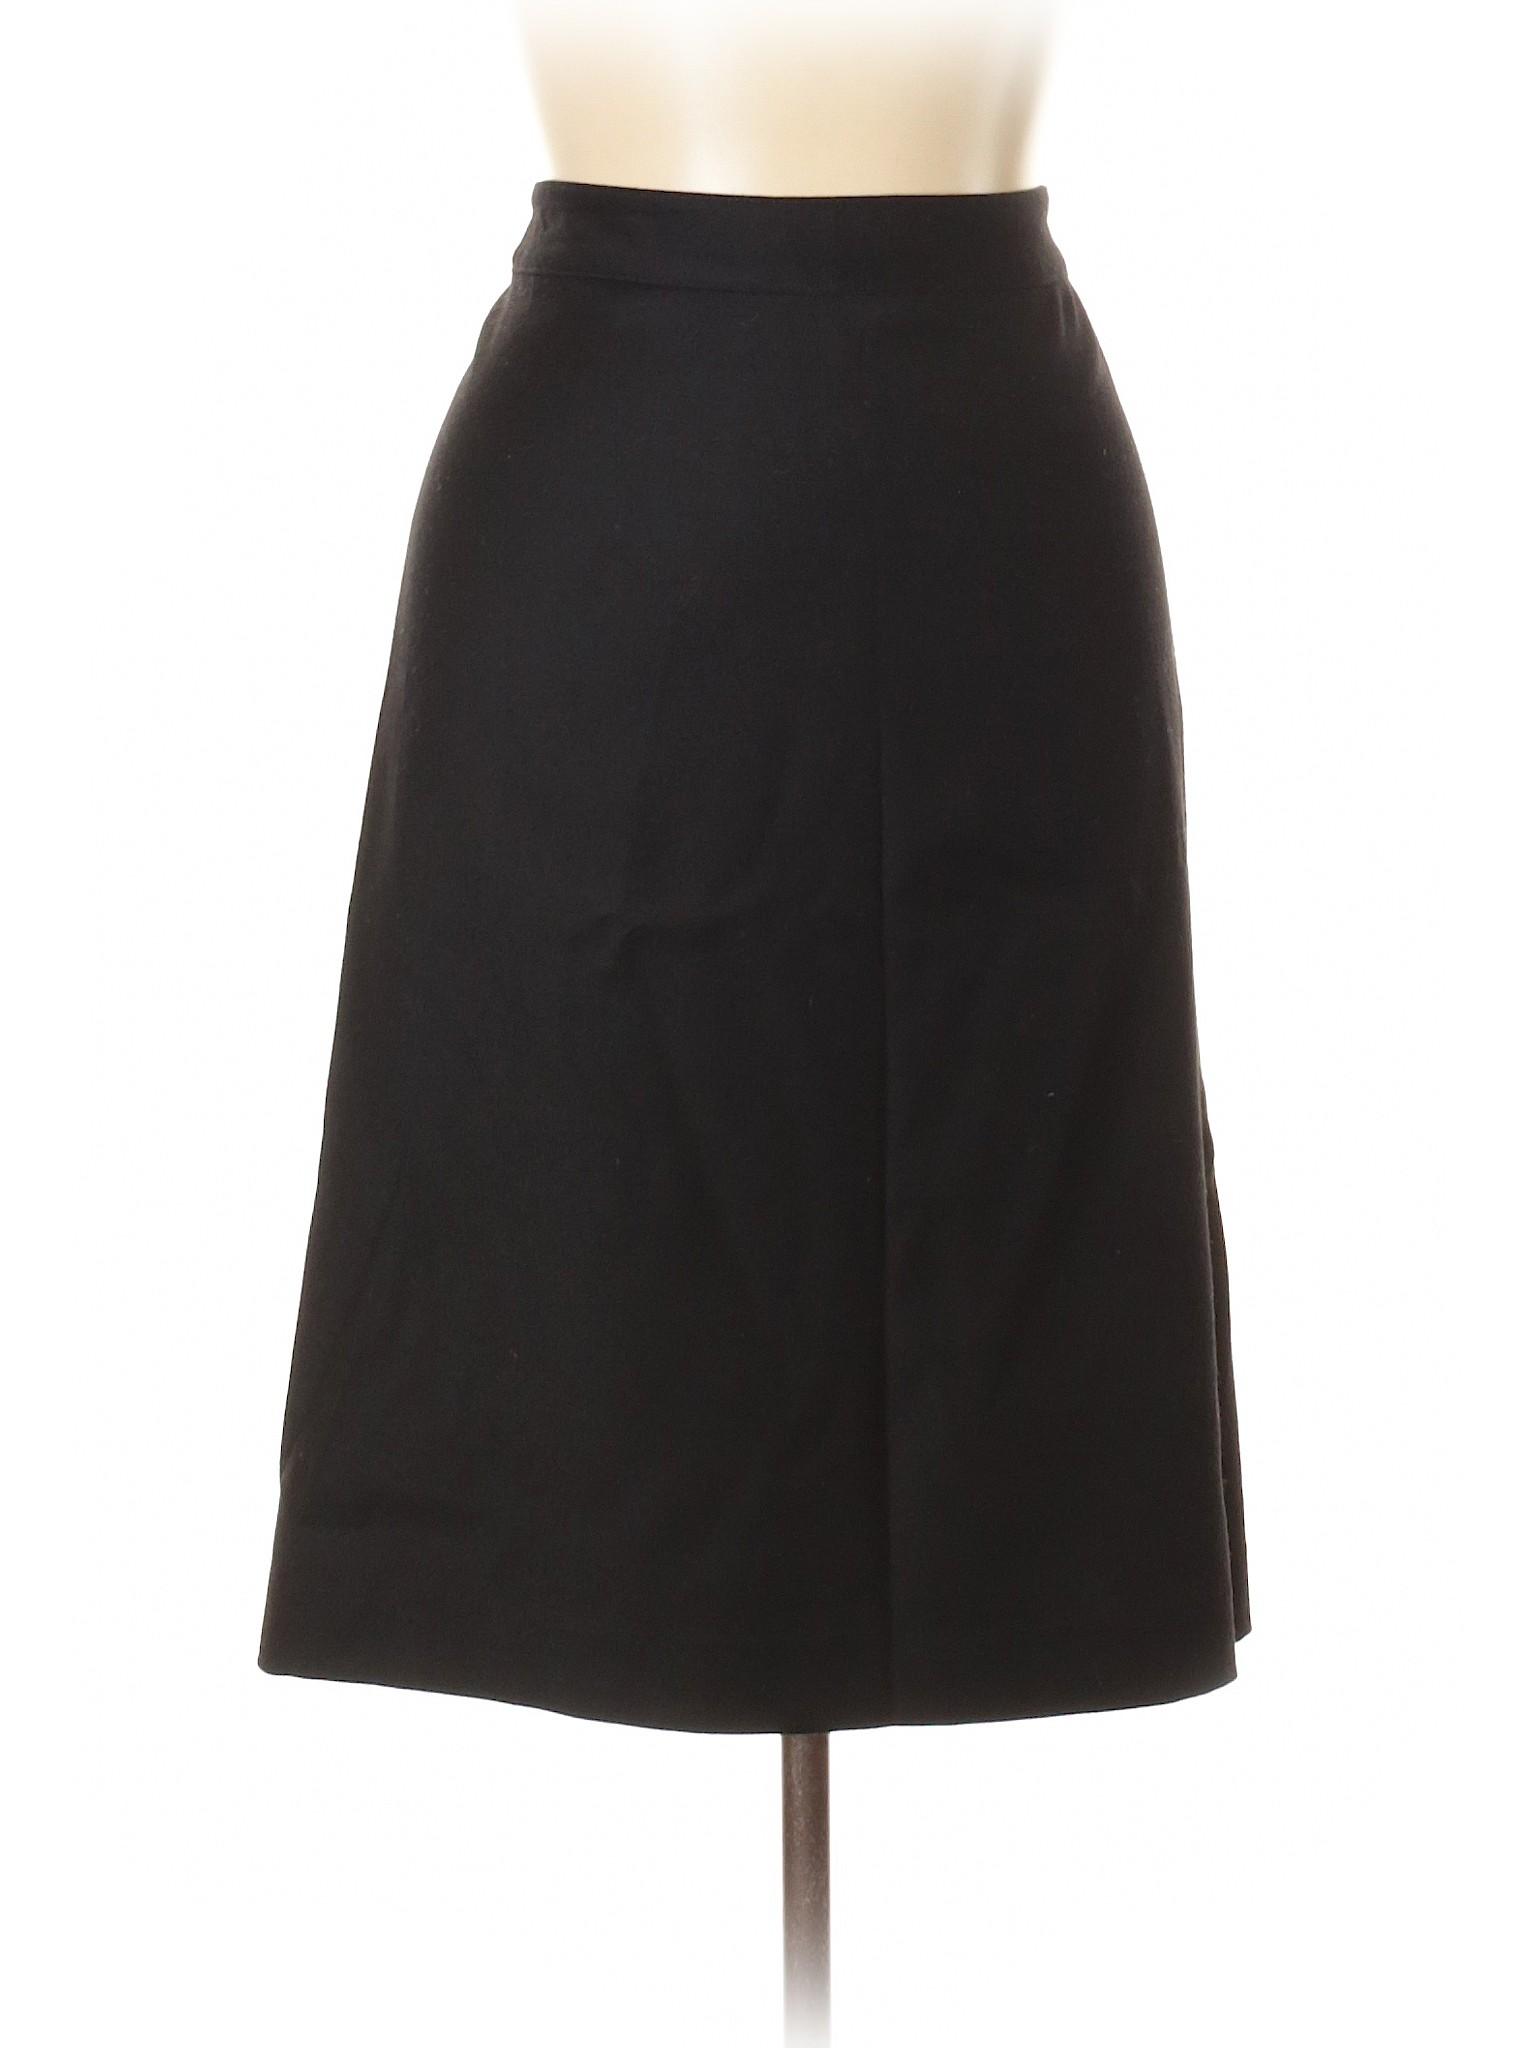 Wool Republic Banana Boutique Skirt leisure n48a6a